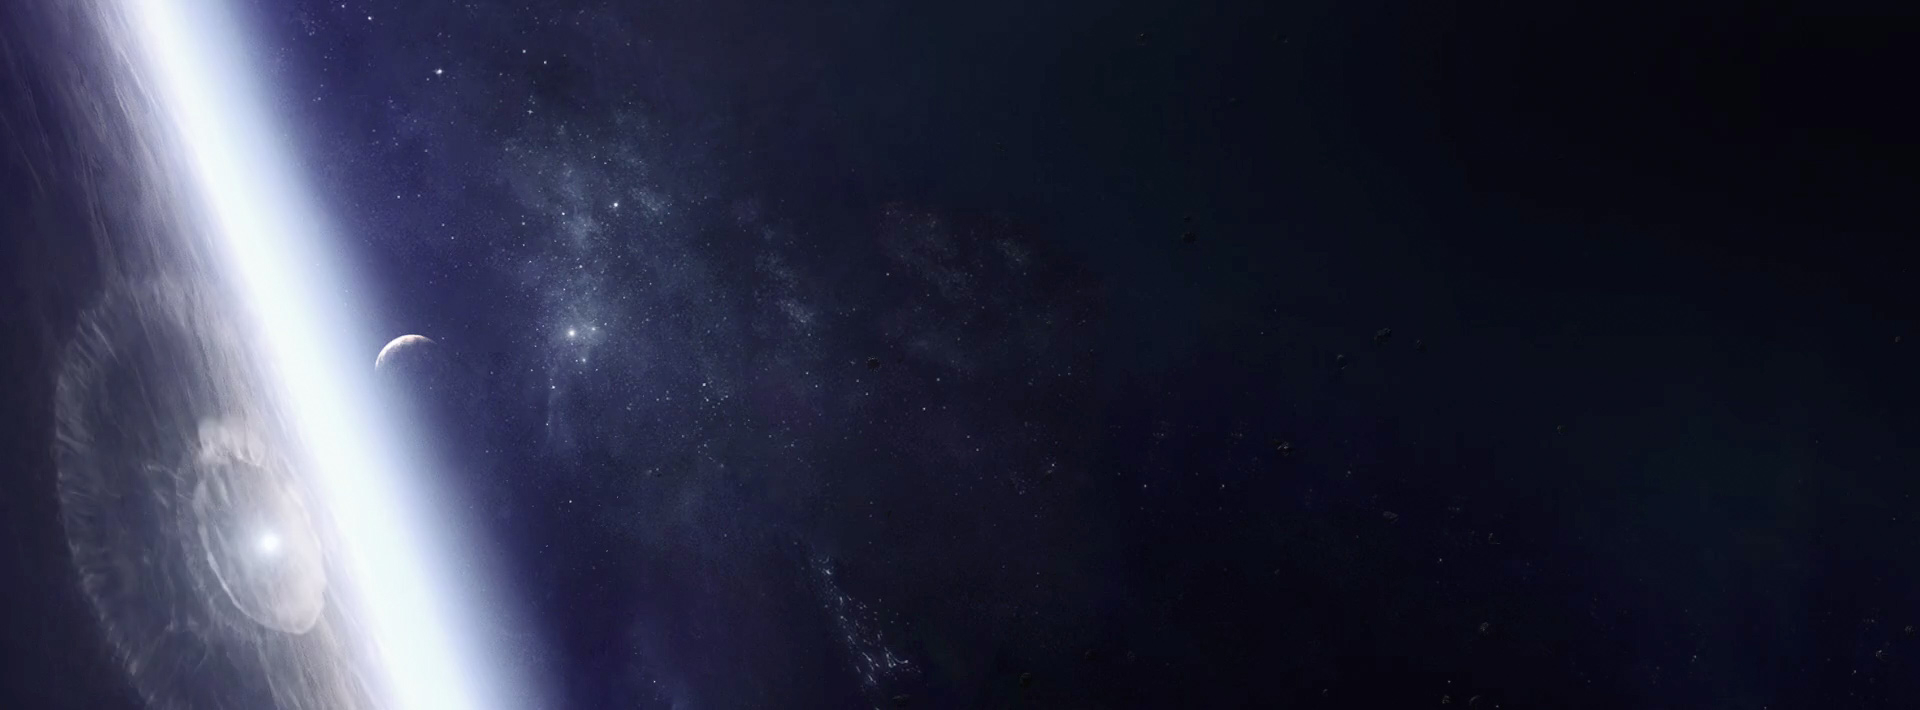 beautifully-shot-sci-fi-short-film-beyond-19.jpg